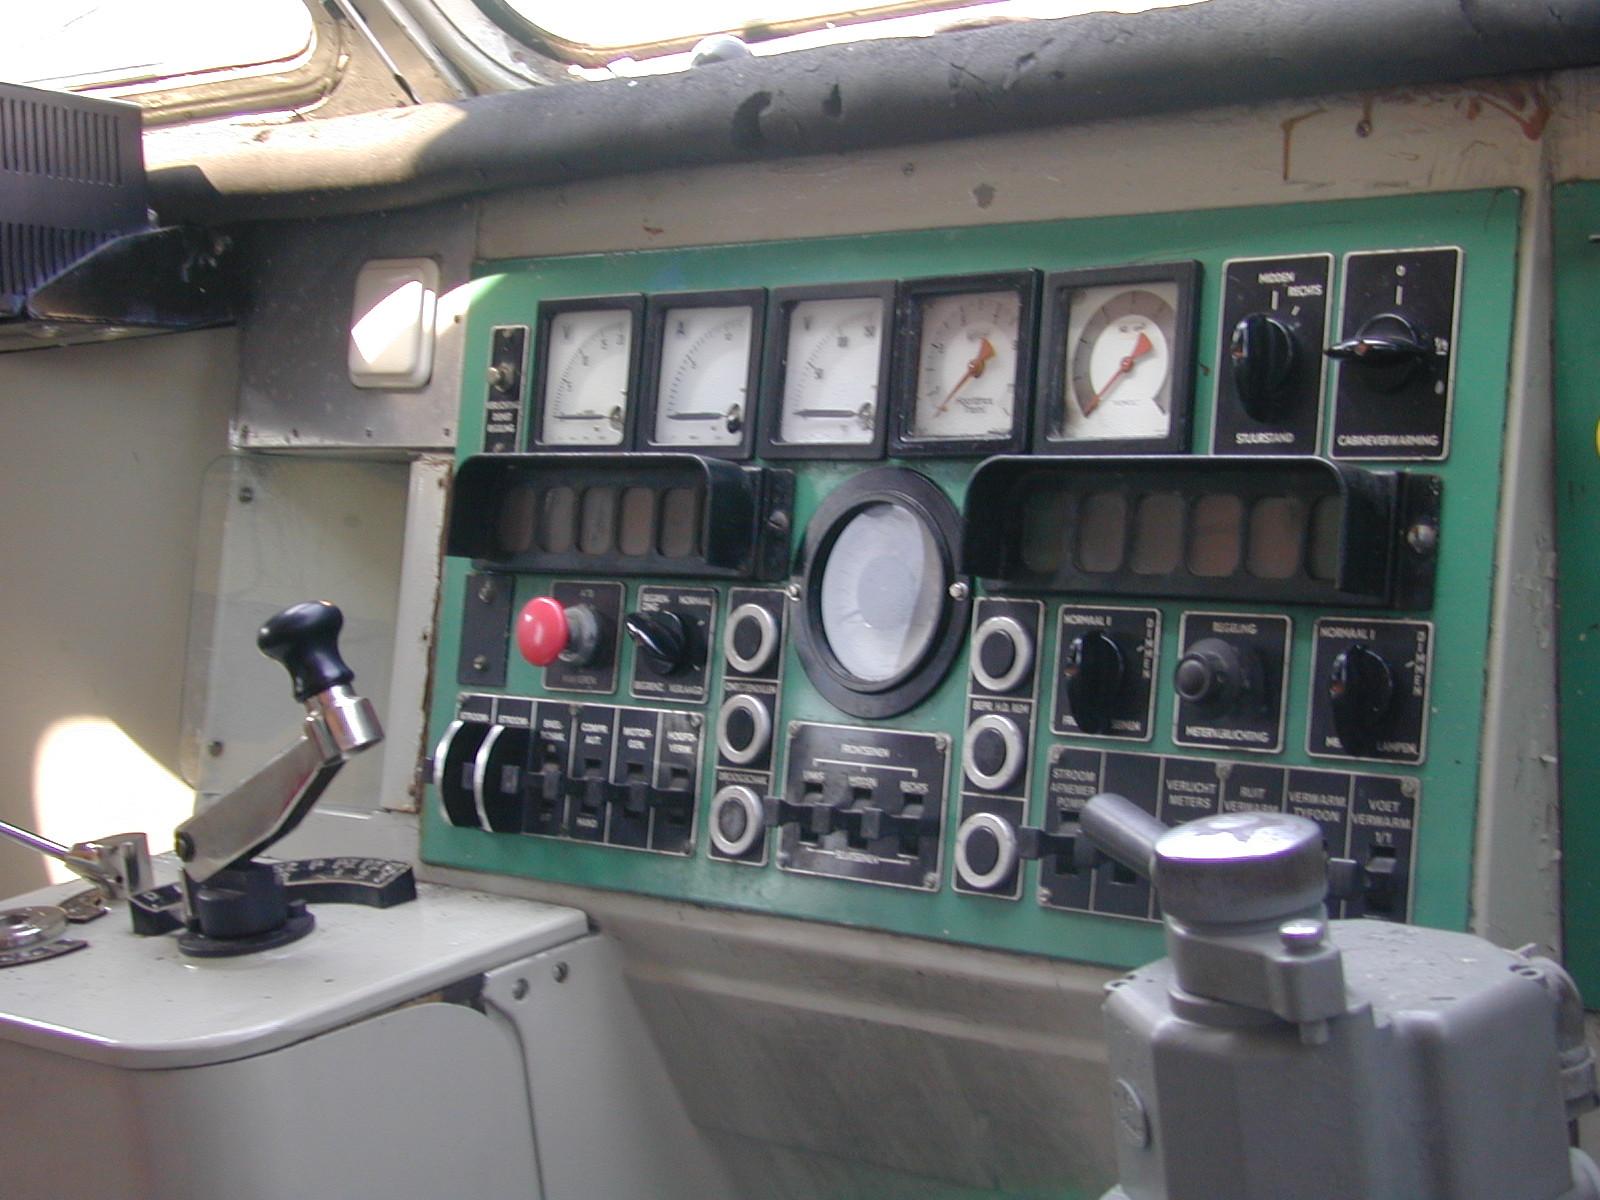 train cockpit panel controls meters dashboard dials